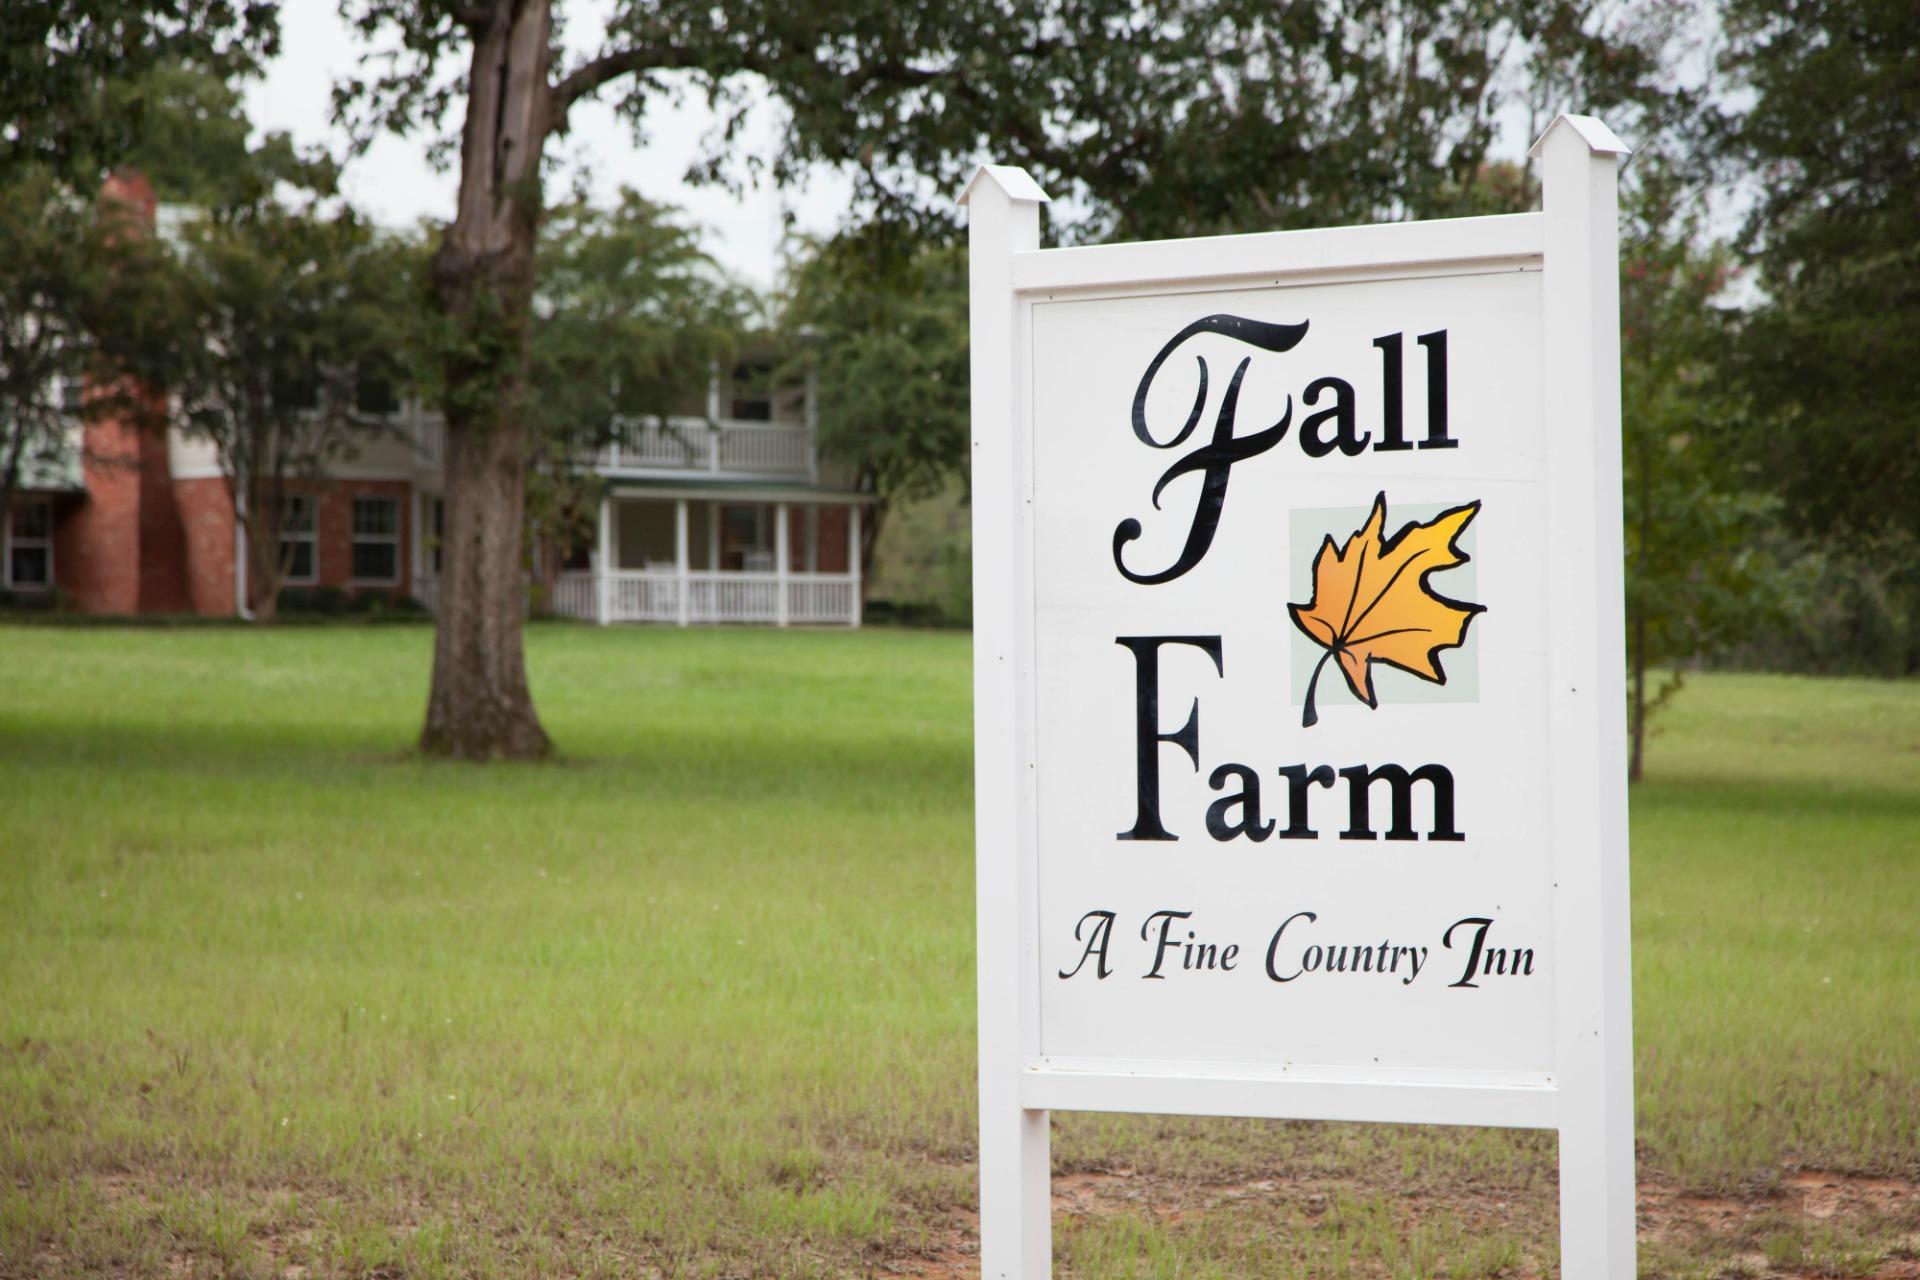 Entrance to Fall Farm